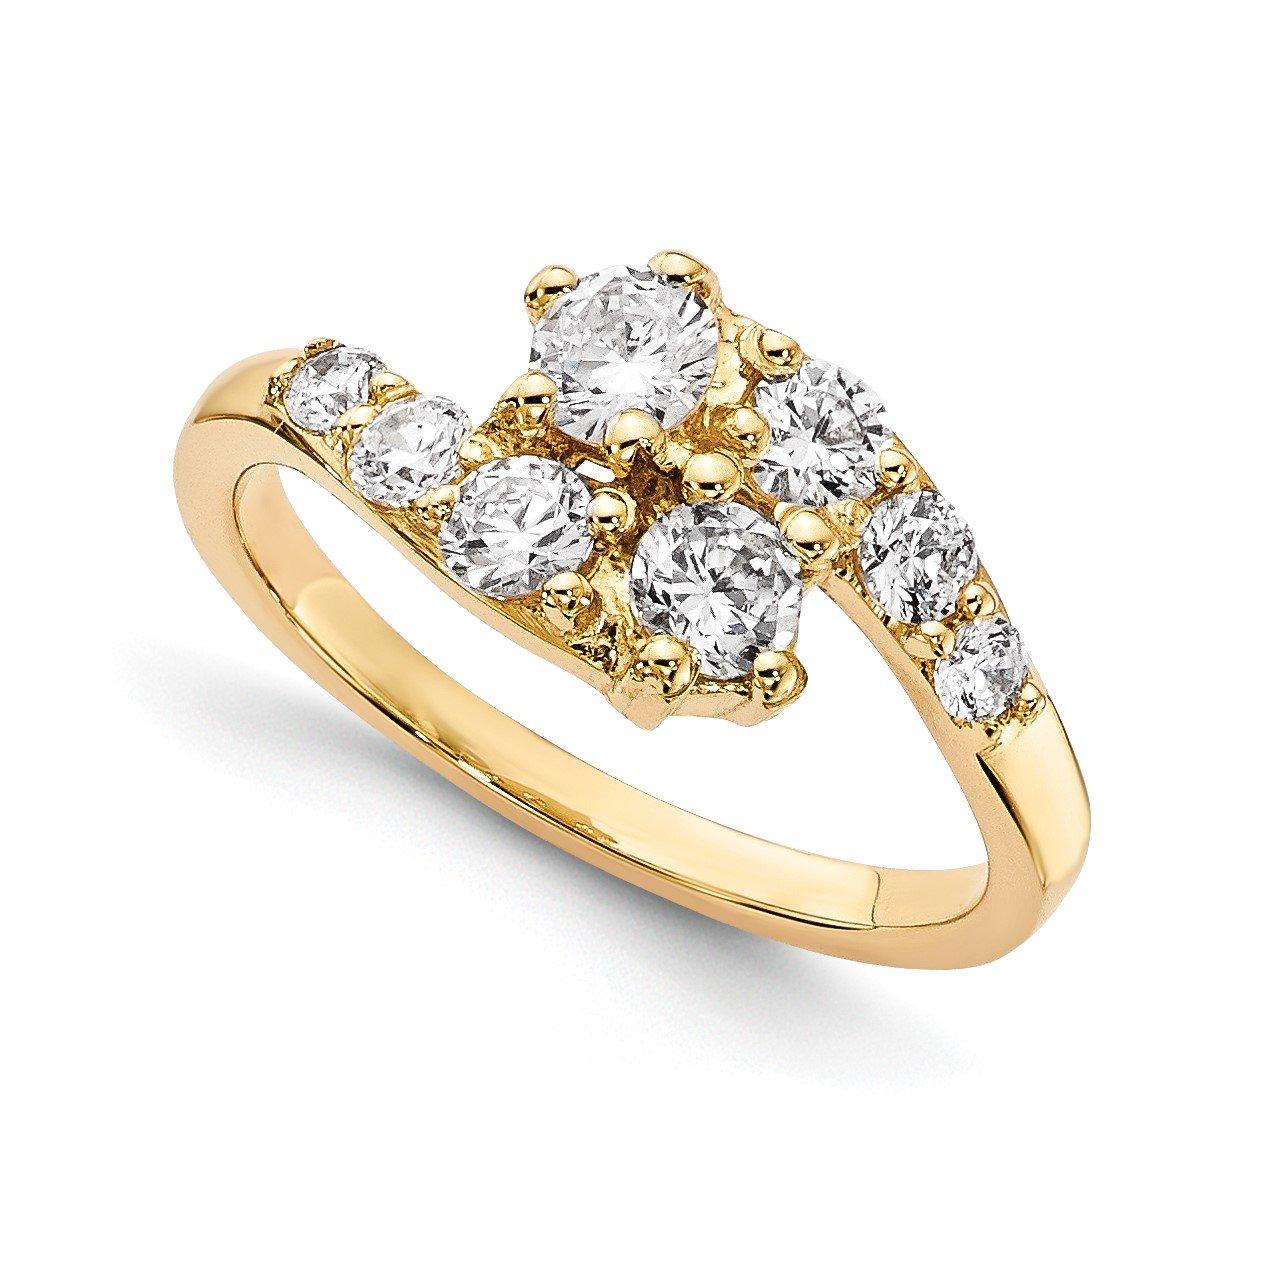 14KY VS Diamond 2-stone Ring Semi-Mount - 2.8 mm center stones